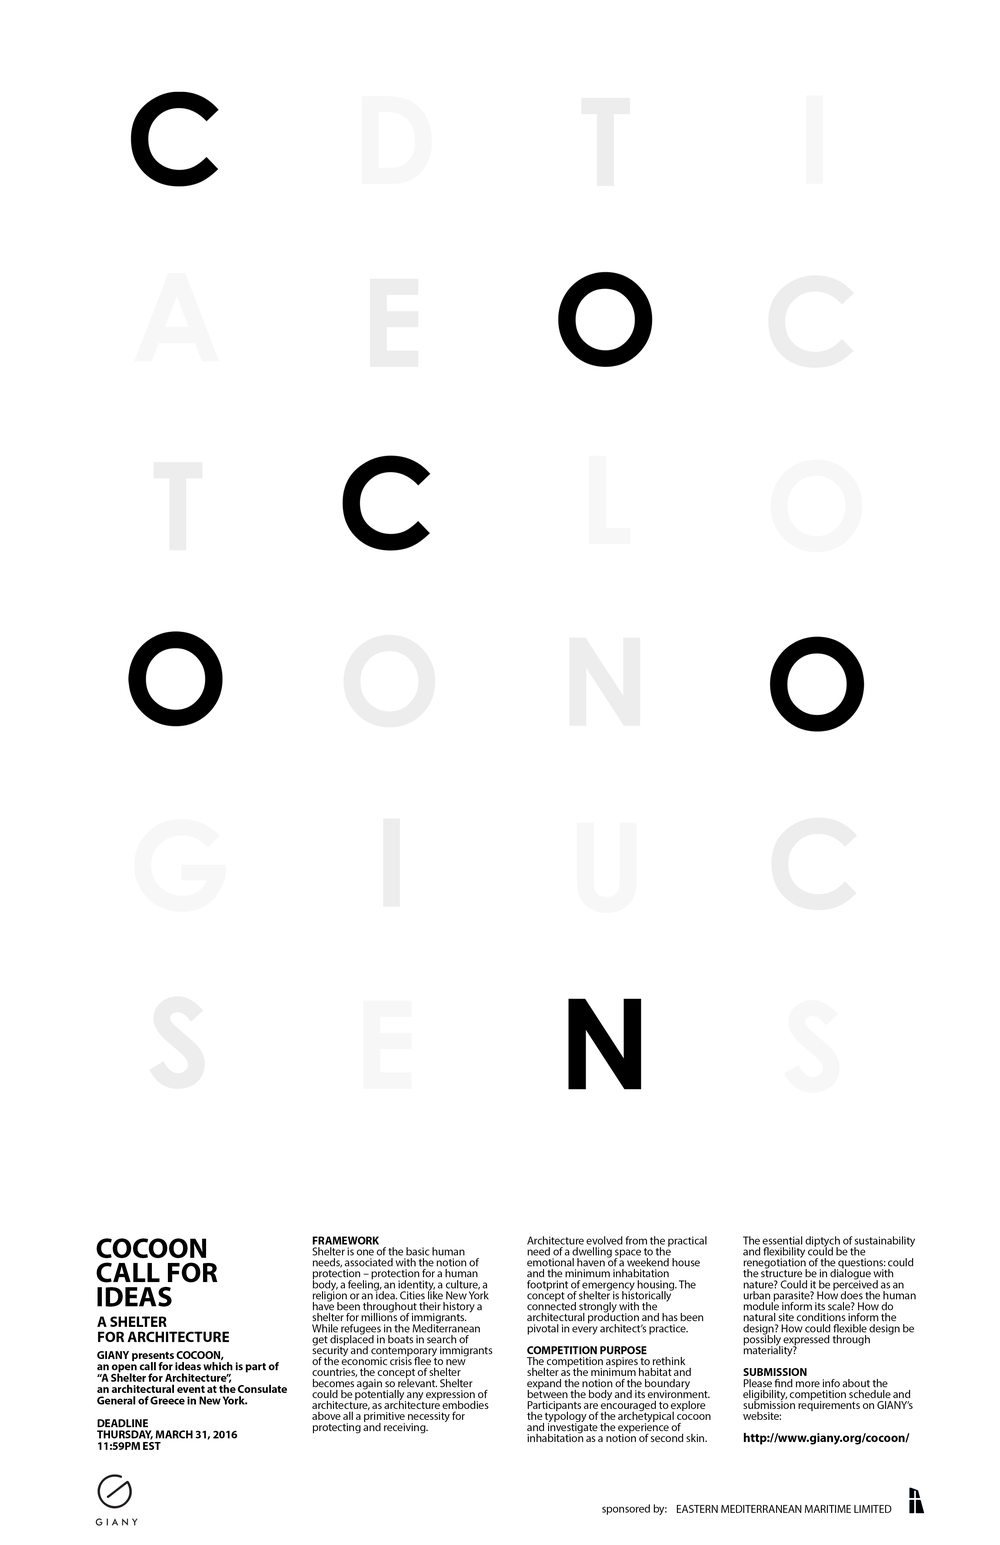 COCOON - GIANY.jpg